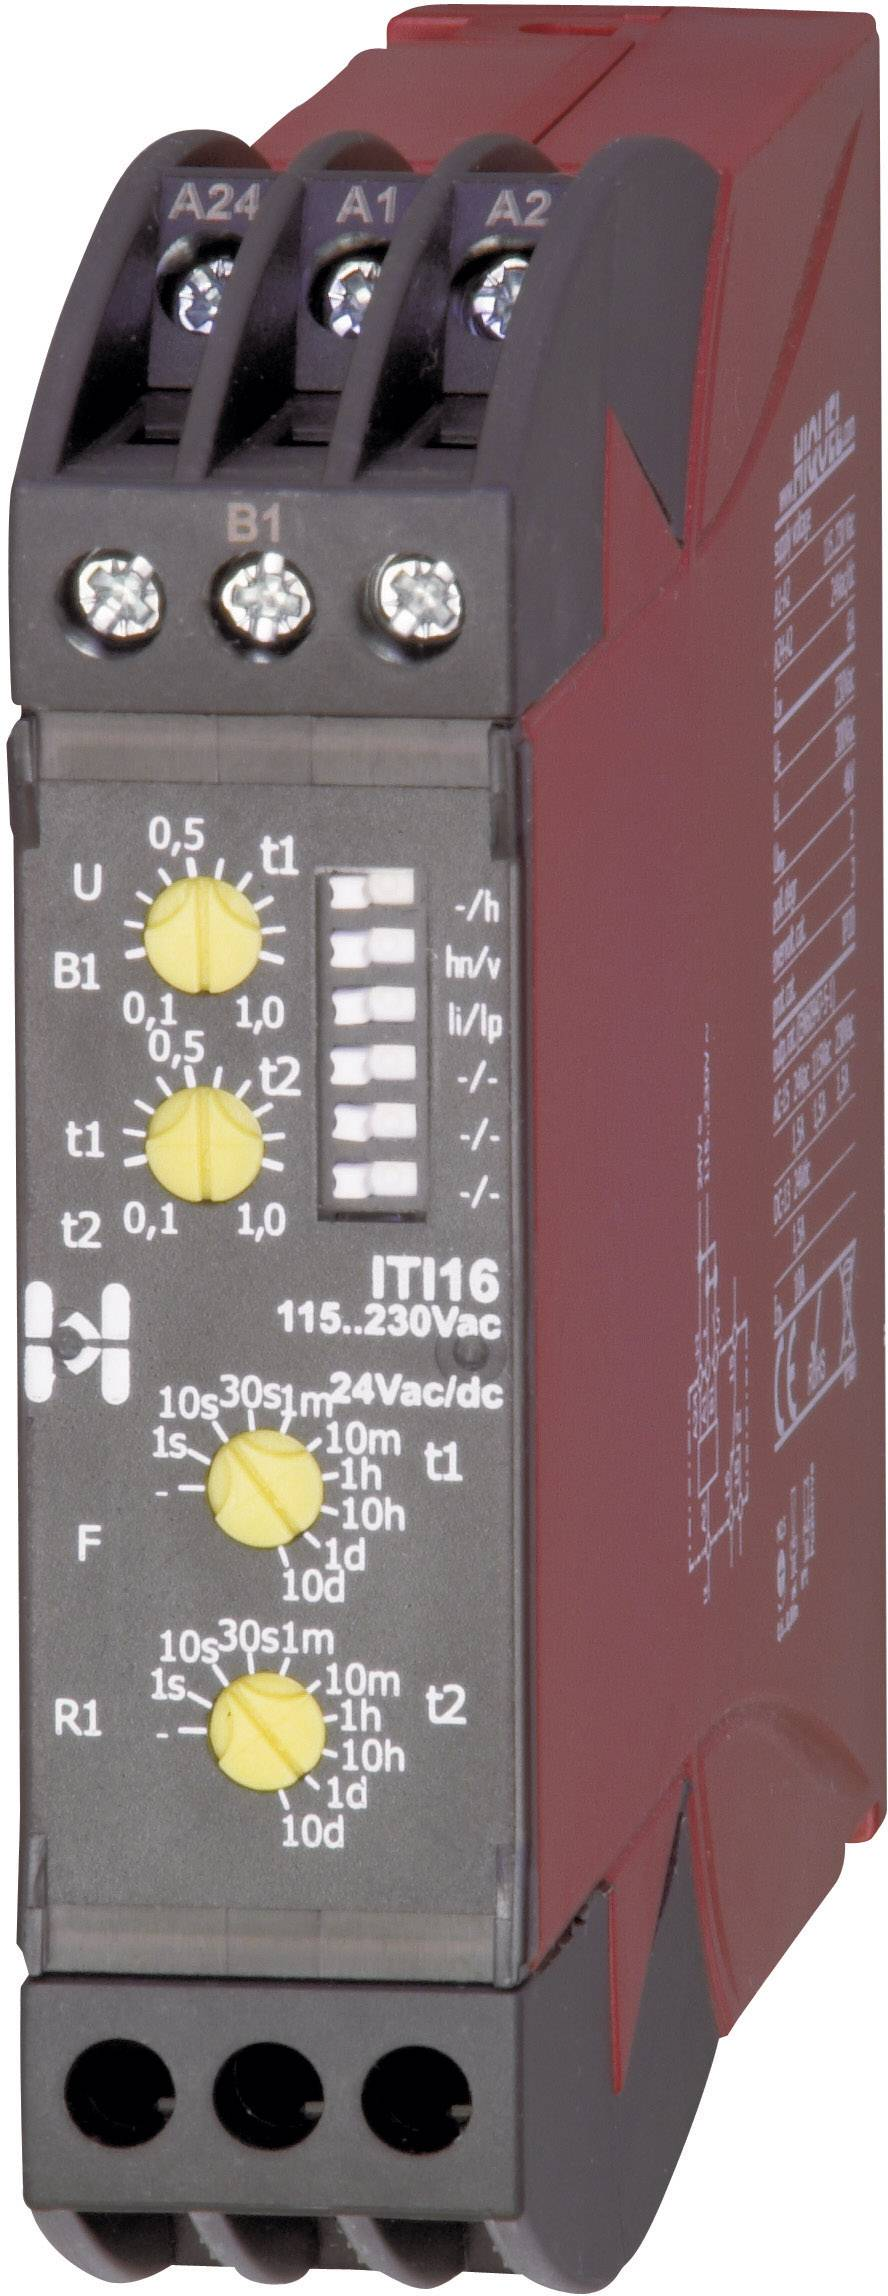 Monitorovací relé in-case Hiquel, ITI 16, in-case